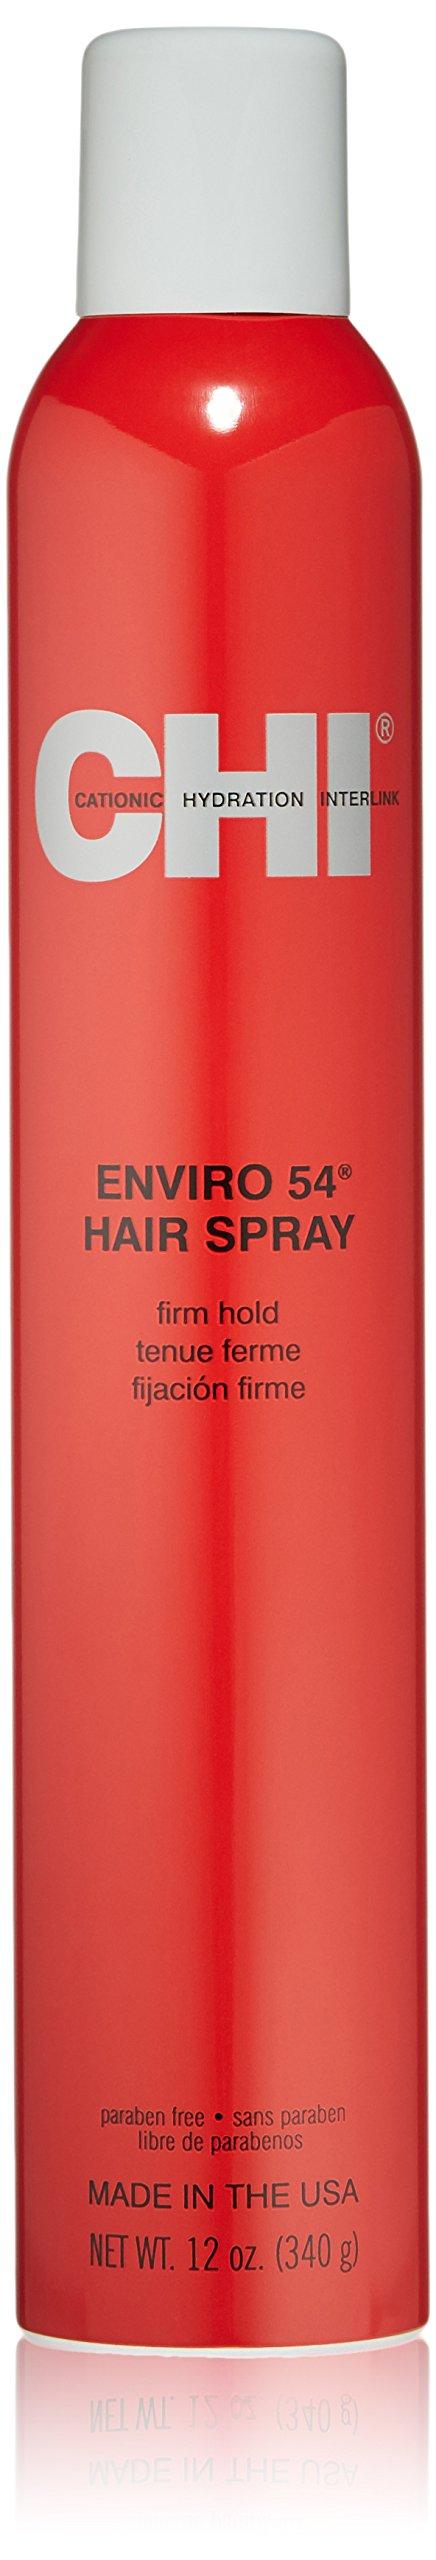 CHI Enviro 54 Firm Hold Hair Spray, 12 Oz by CHI